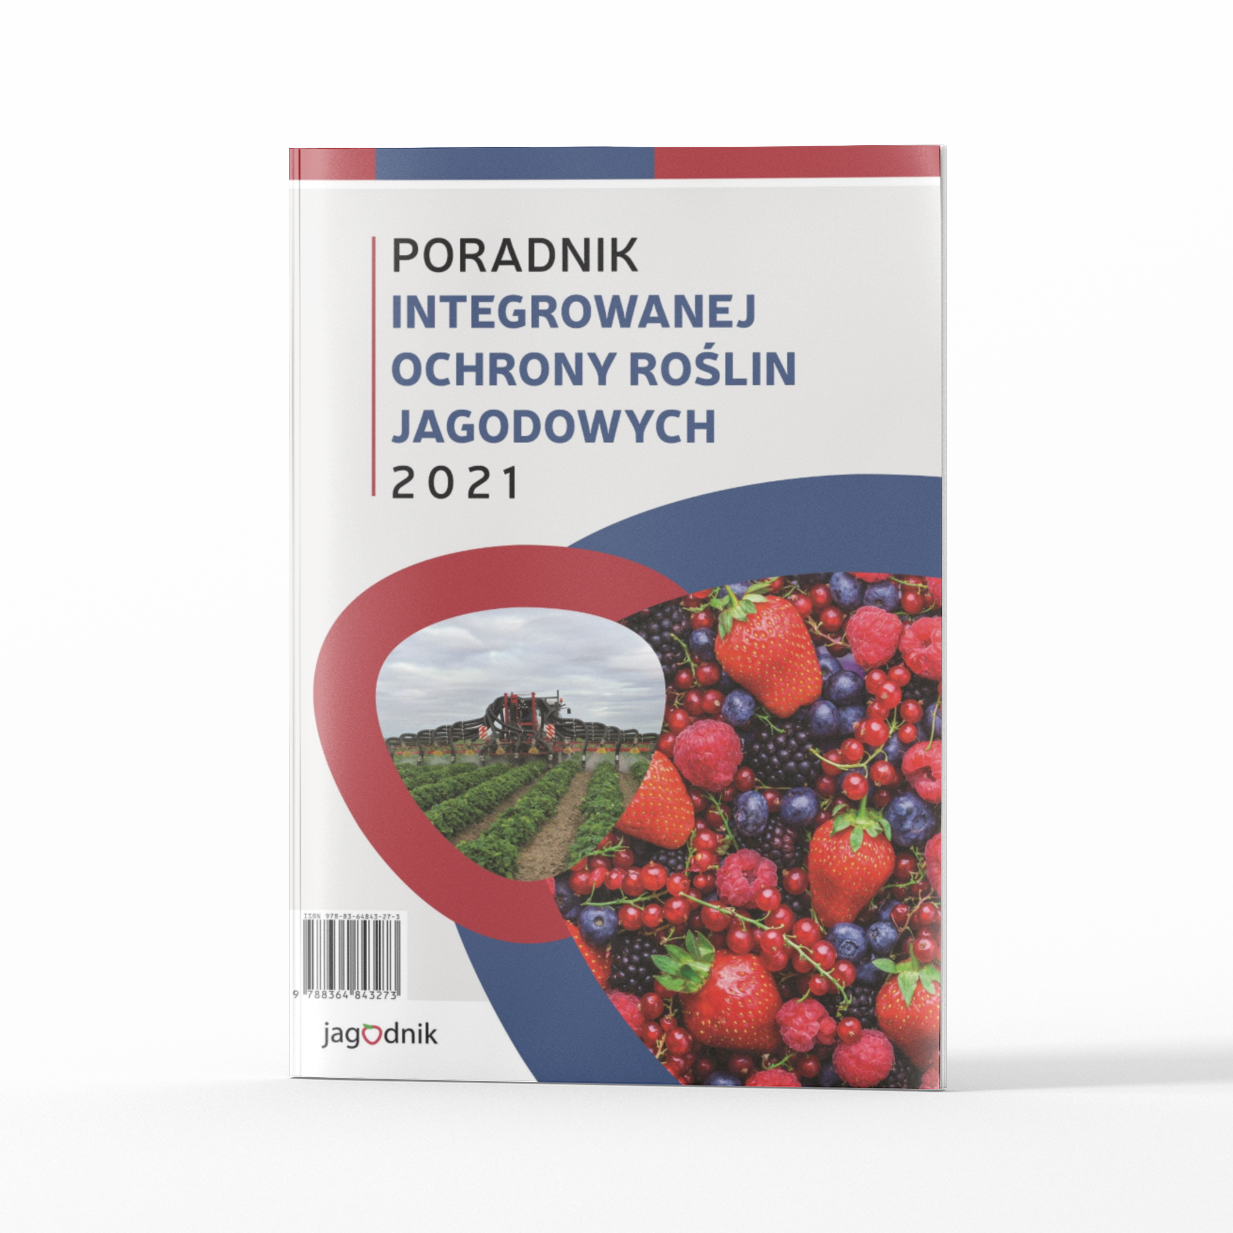 Poradnik integrowanej ochrony roślin jagodowych 2021